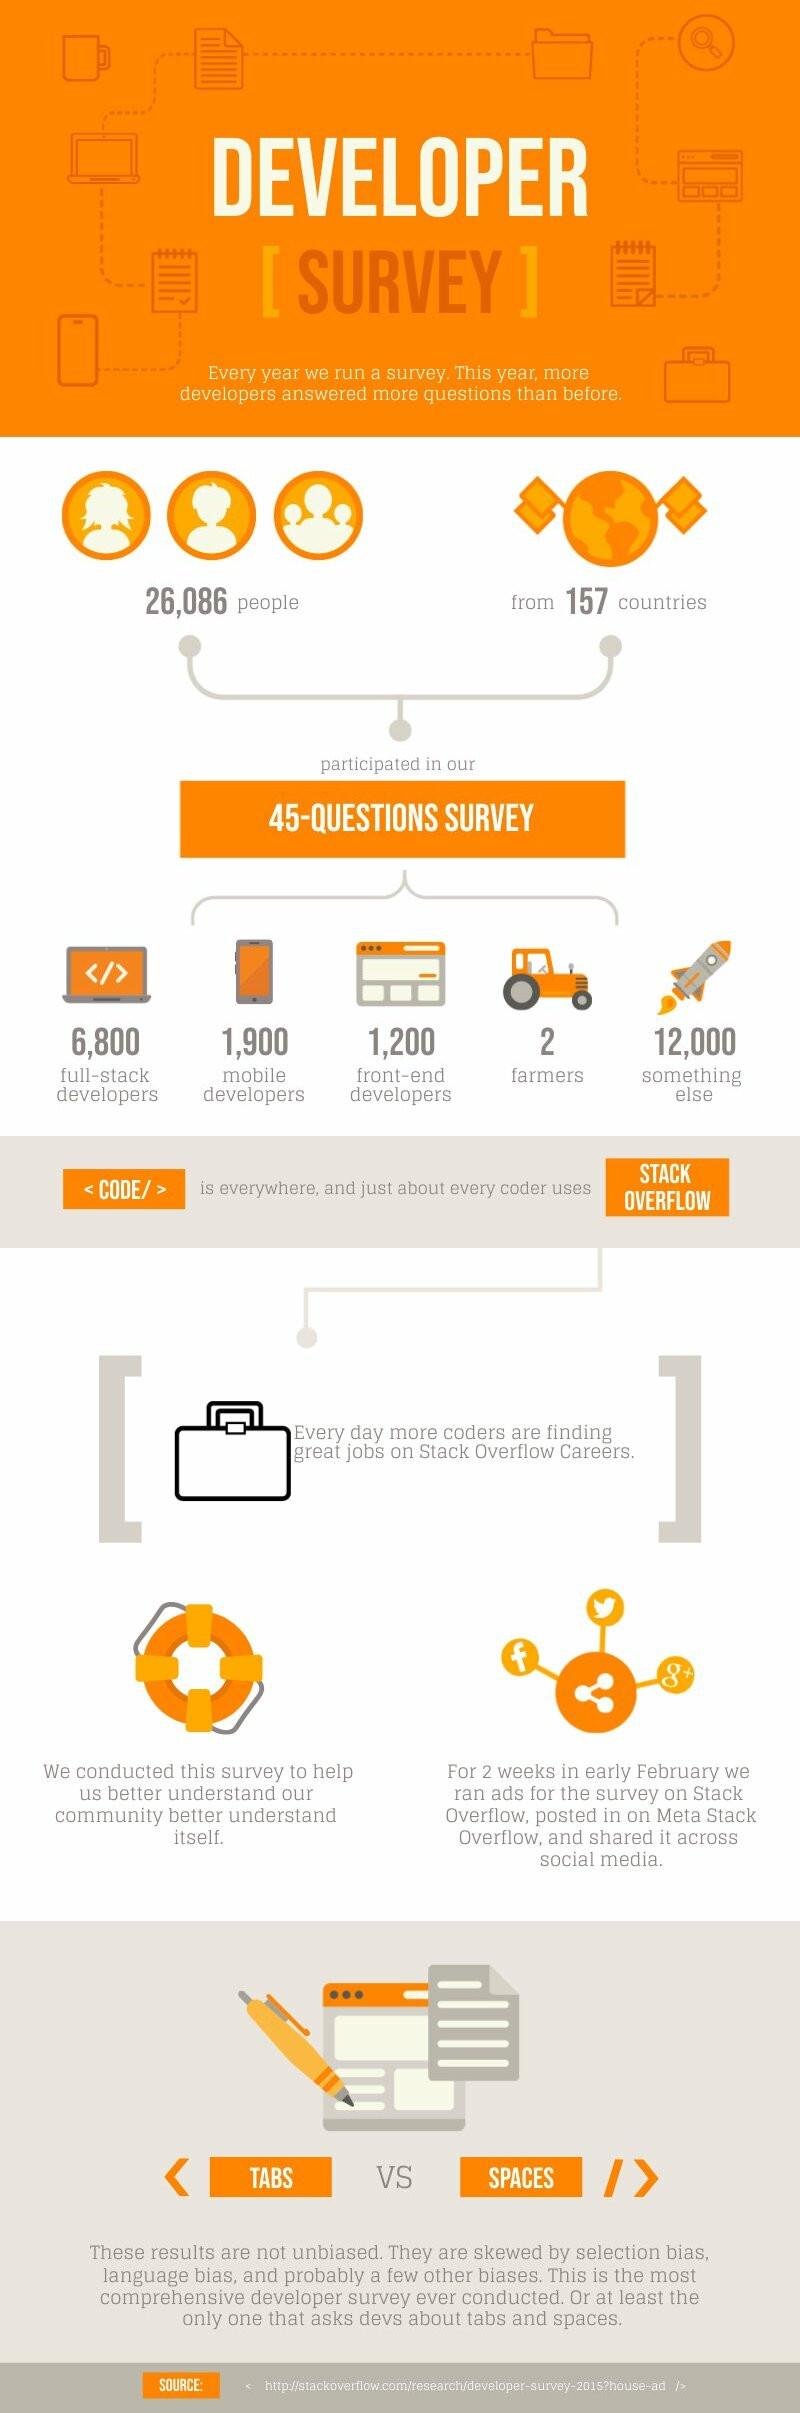 Developer Survey Report